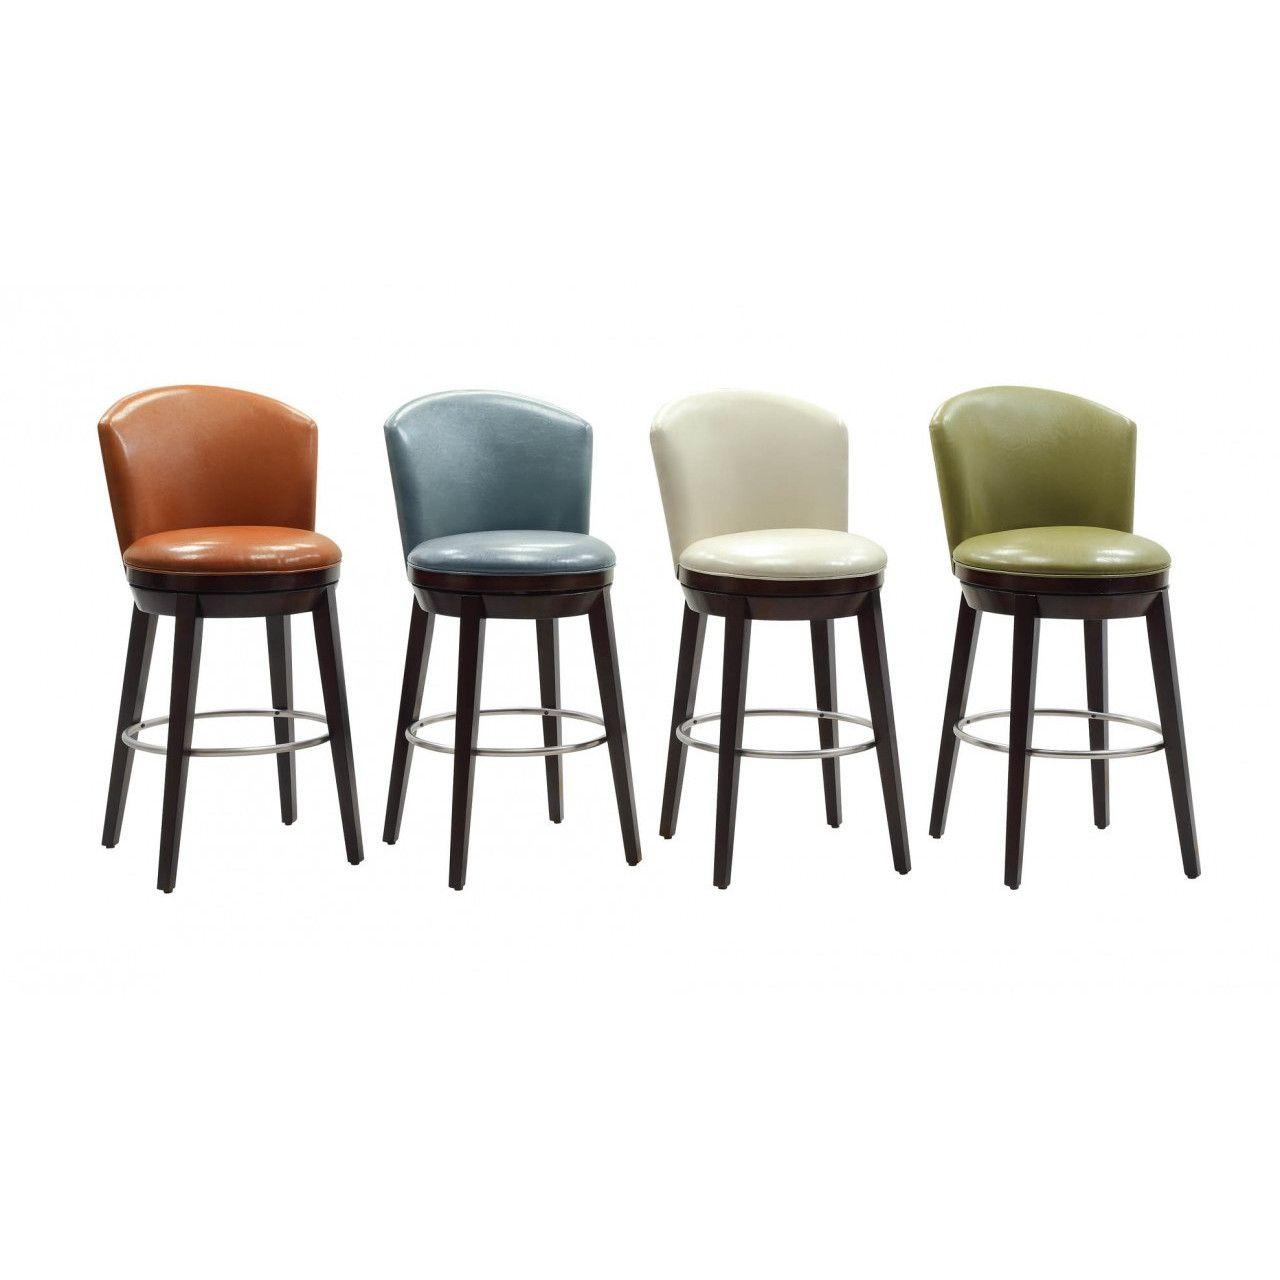 Sunrise Furniture Megan 30 Swivel Bar Stool With Cushion Set Of 2 Bar Stools Stool Swivel Bar Stools